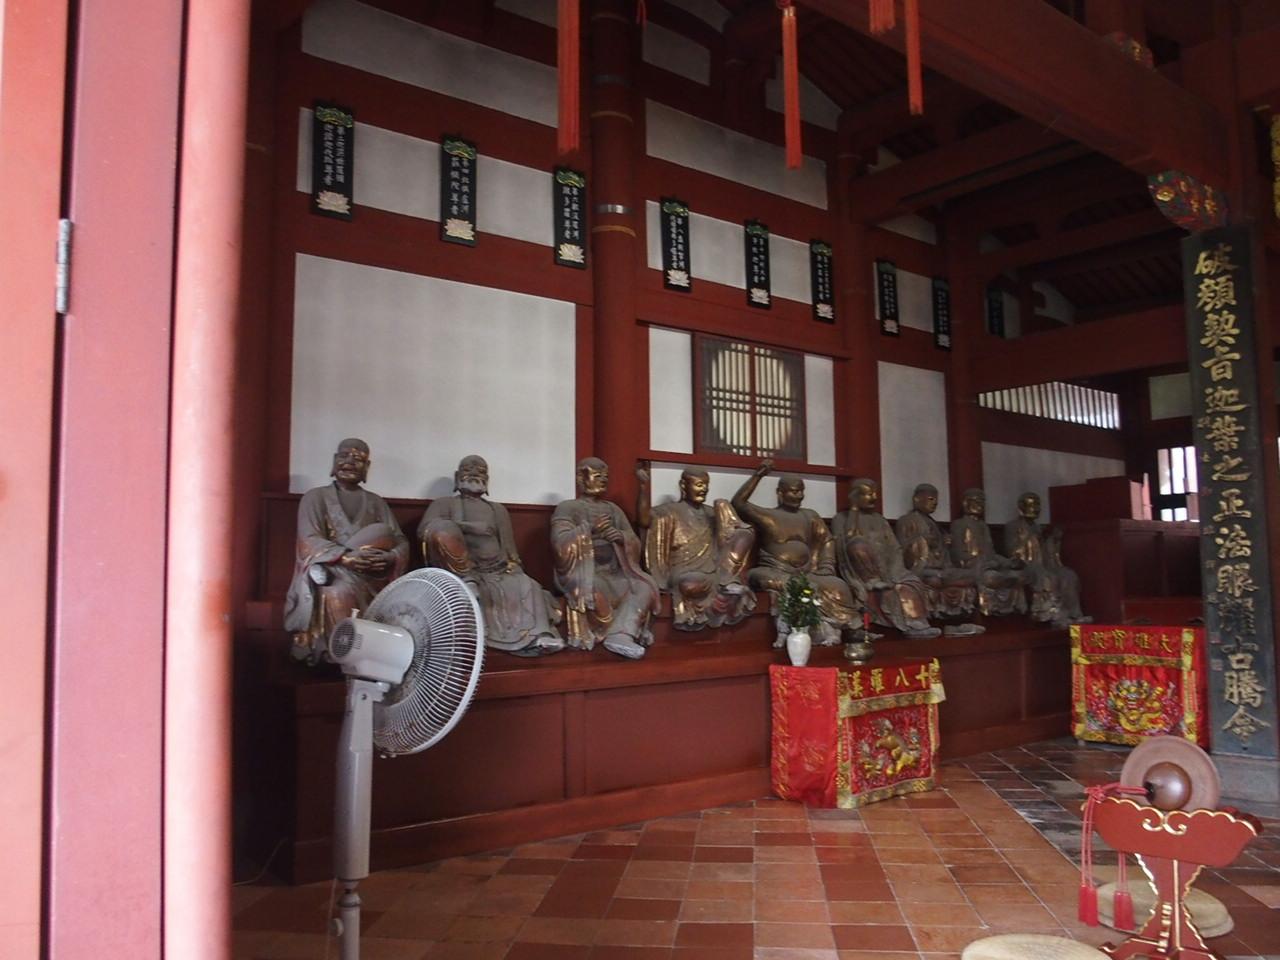 長崎の崇福寺の国宝大雄宝殿の十八羅漢